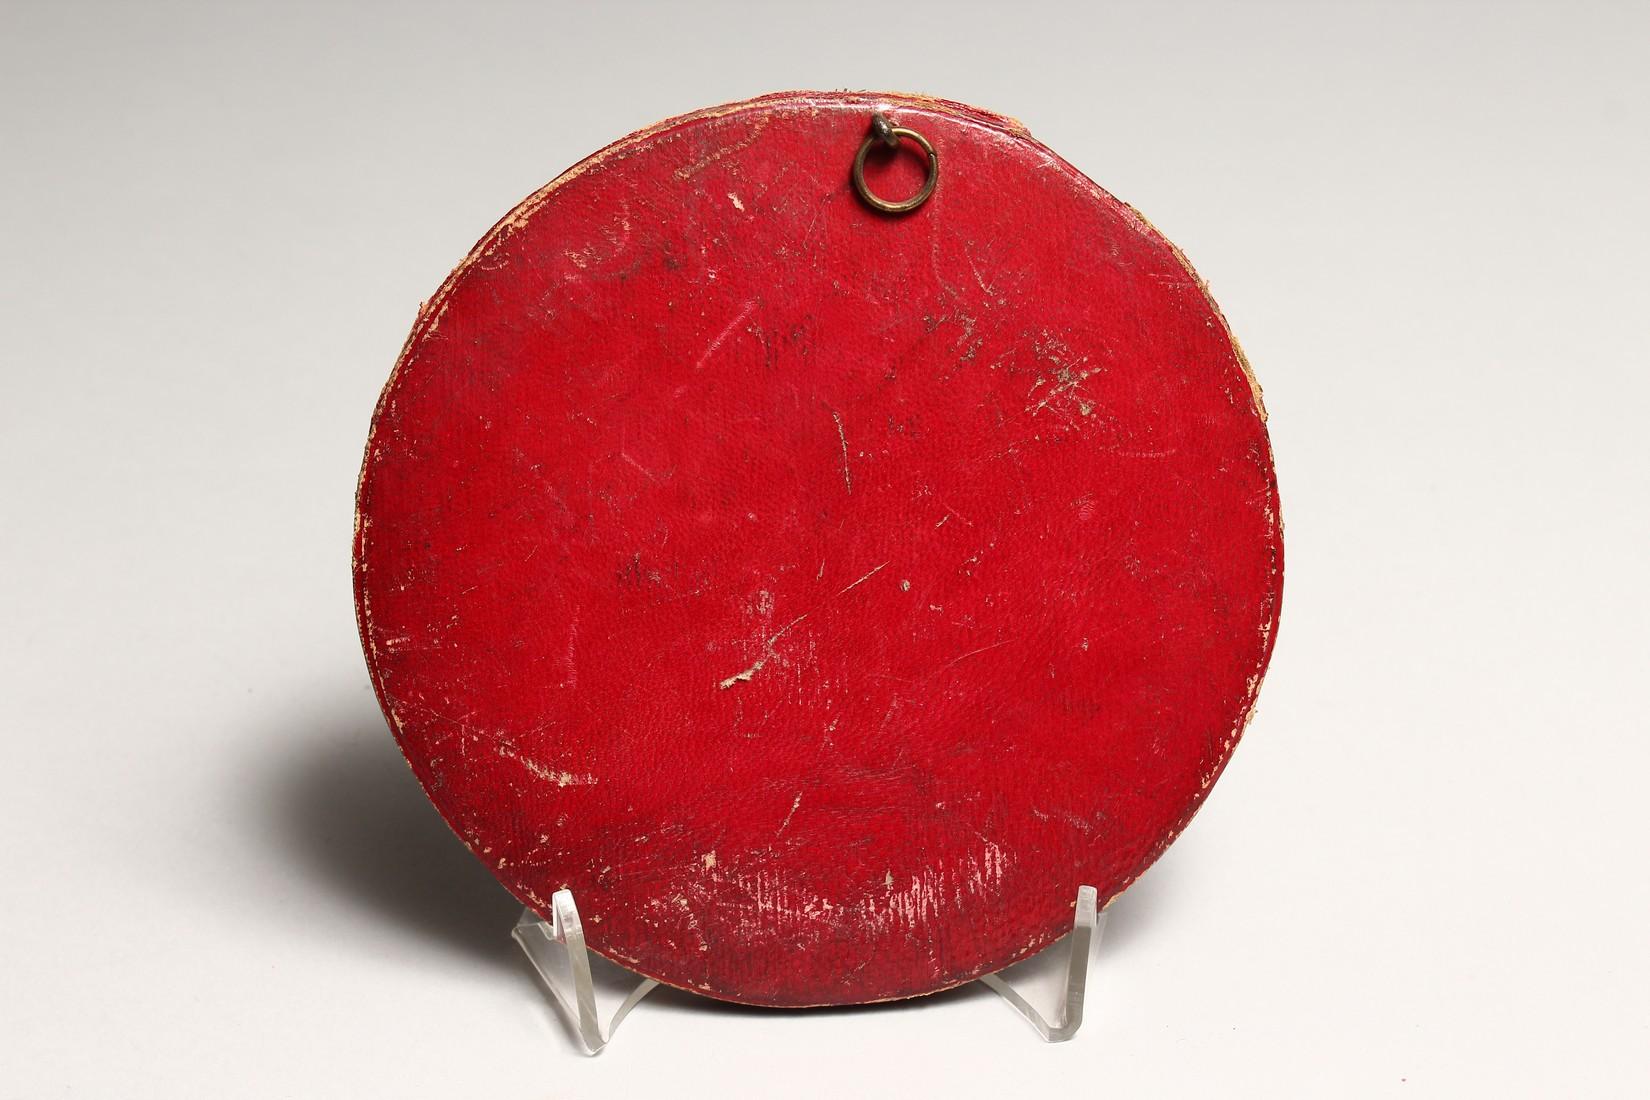 A LARGE ANTIQUE CIRCA 1810 ANDRIEU FECIT BRONZE CIRCULAR PLAQUE OF NAPOLEAN Signed 5.75ins - Image 2 of 2